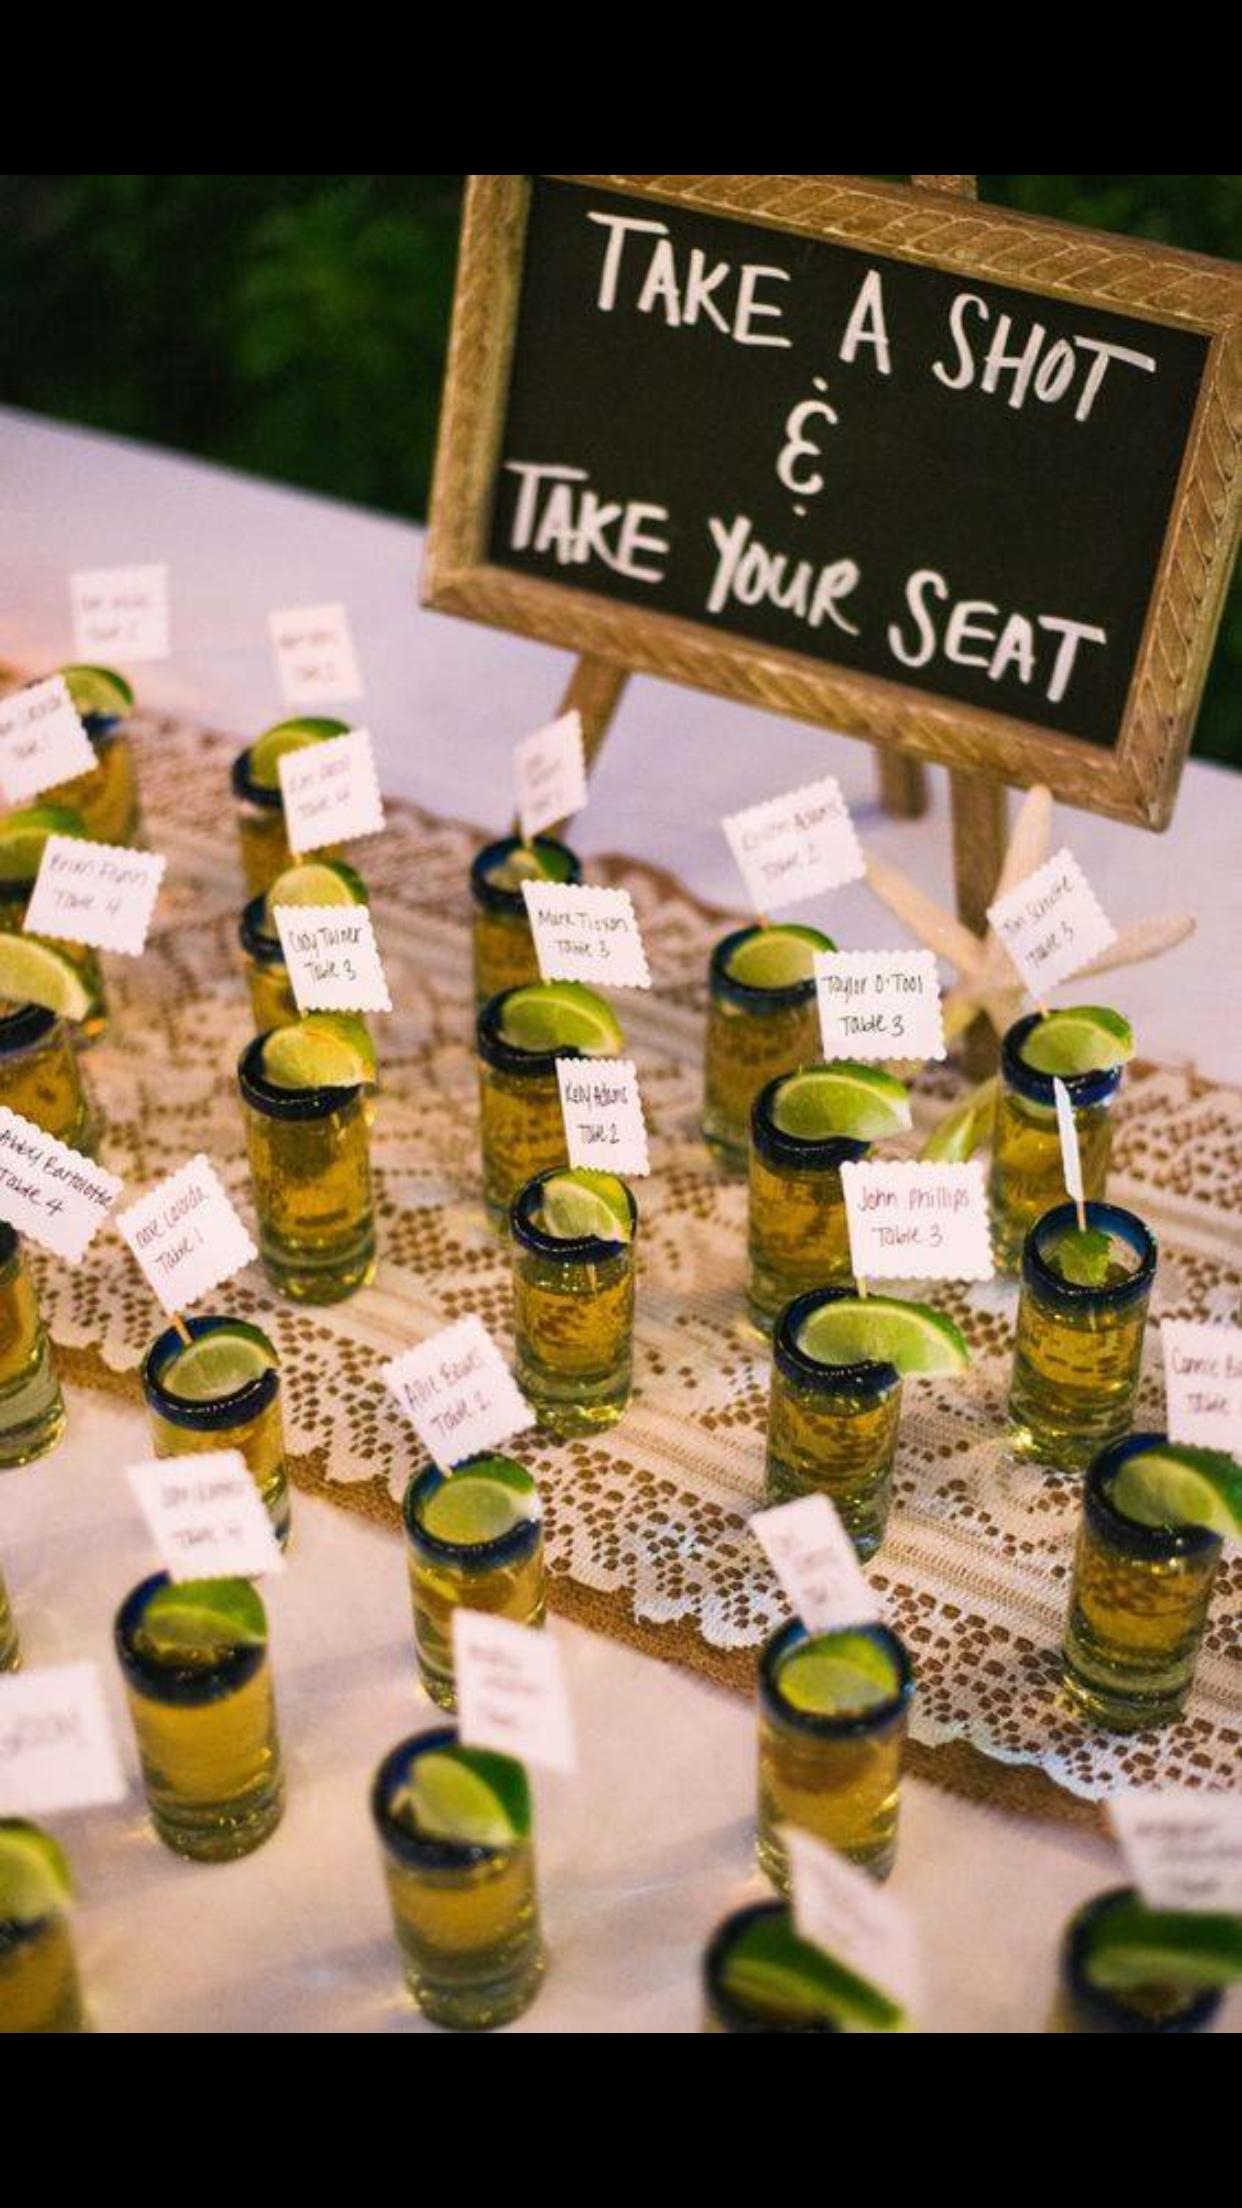 Pin by Camilla Pate on Wedding food | Pinterest | Wedding, Wedding ...